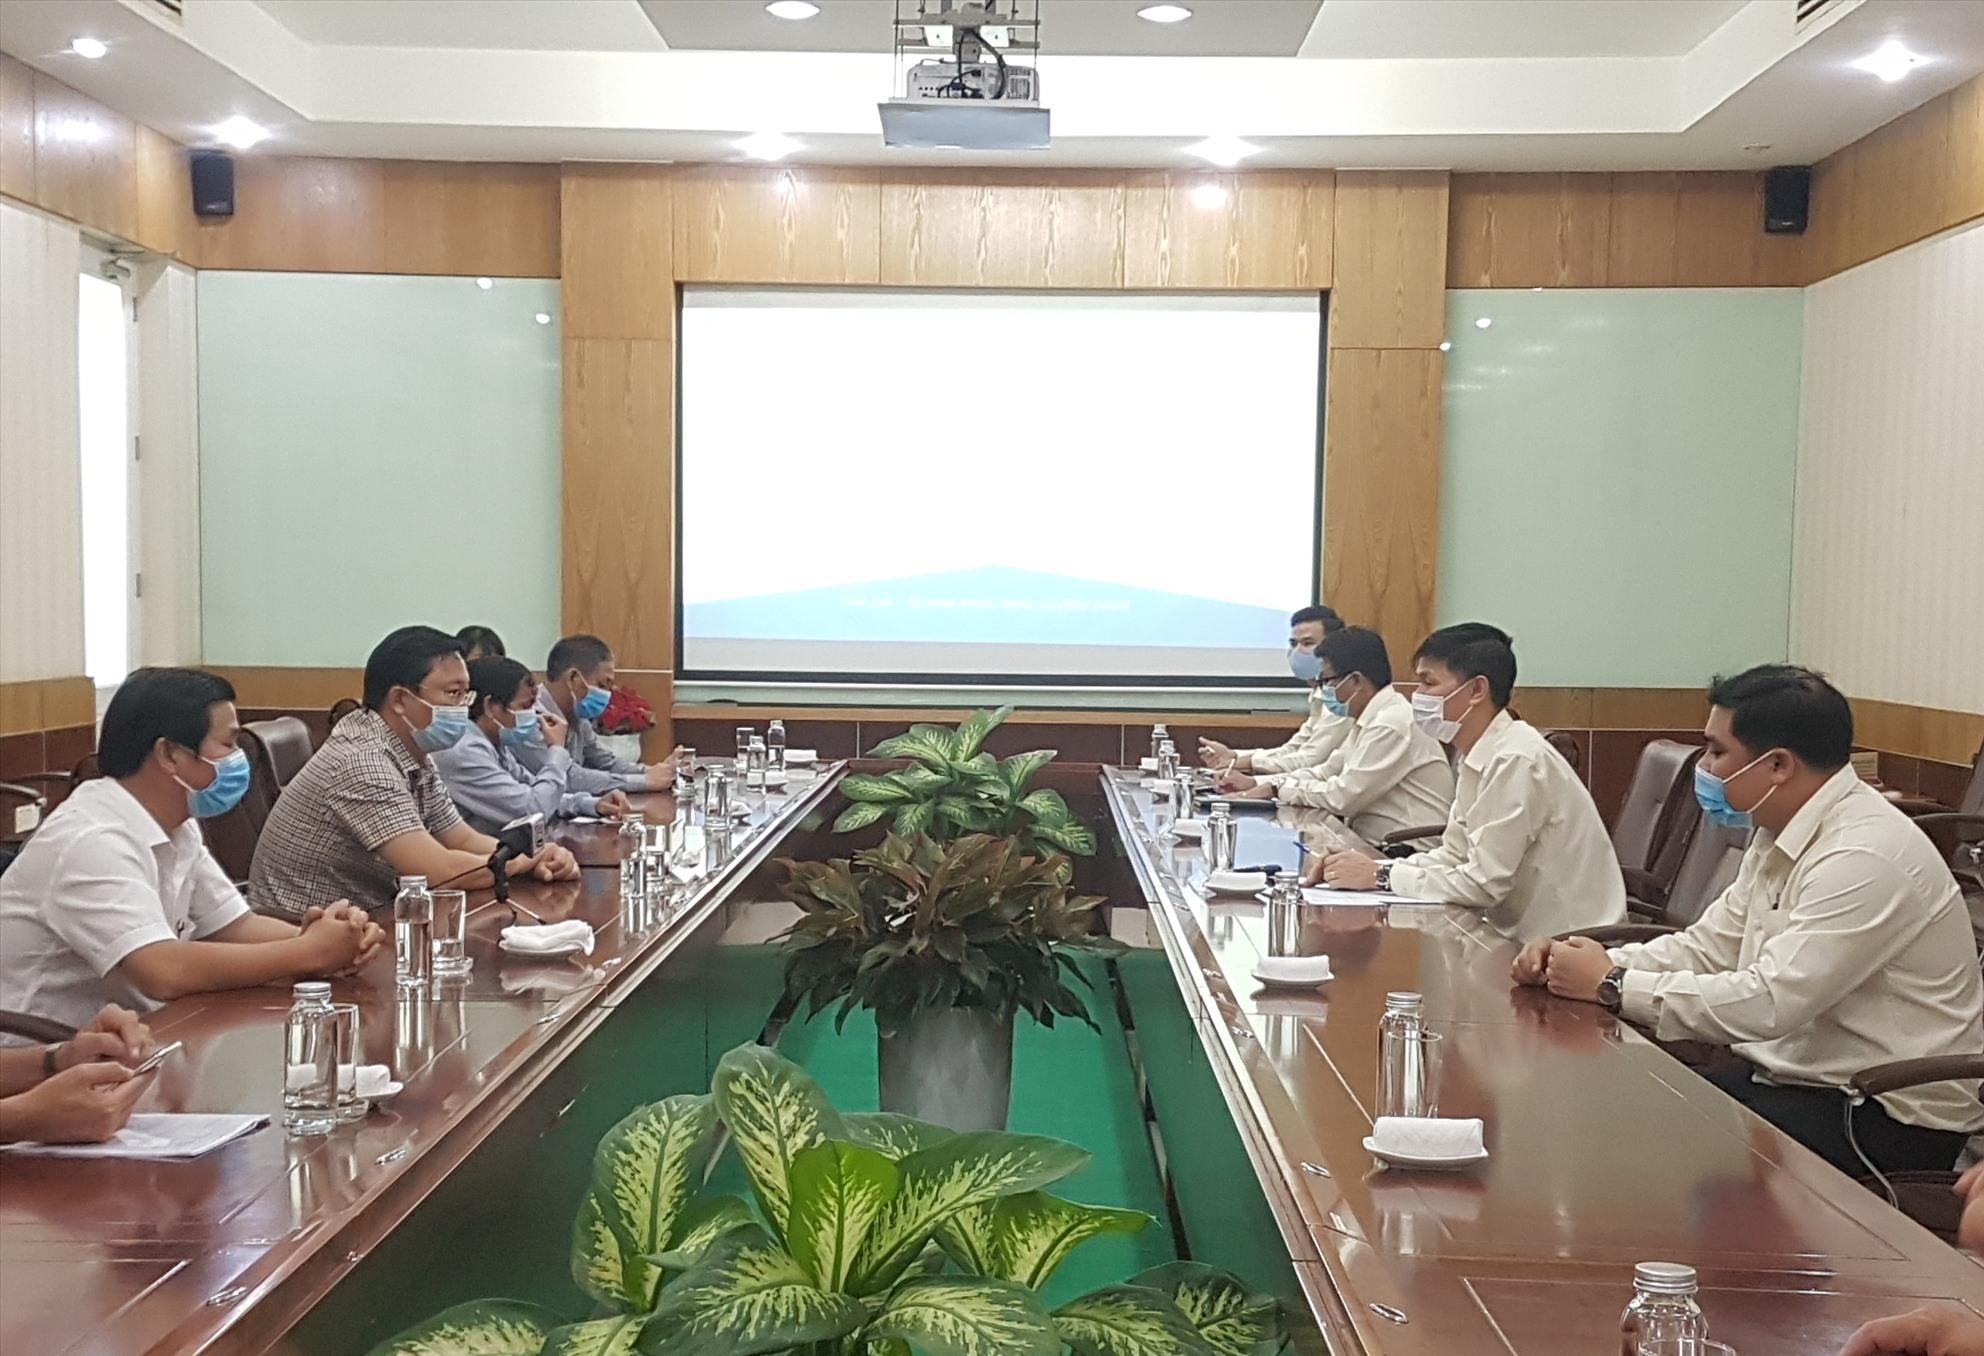 Quang Nam leaders and representatives of Truong Hai Auto Company